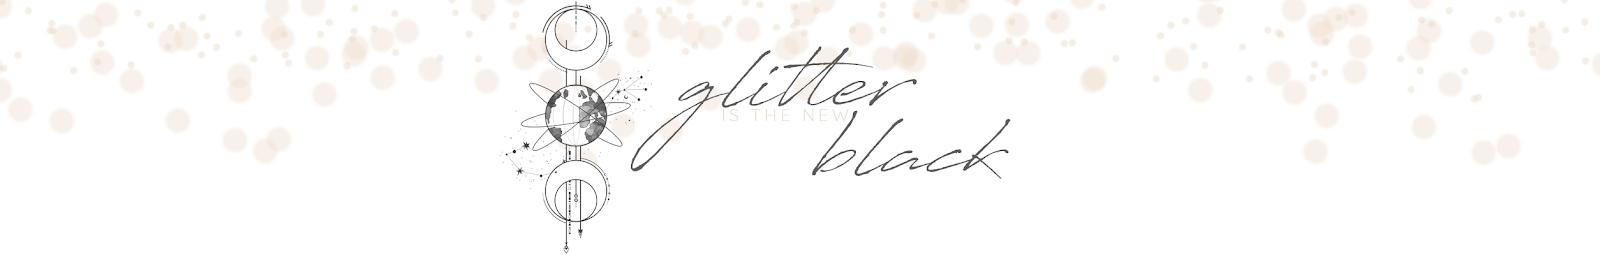 glitter is the new black